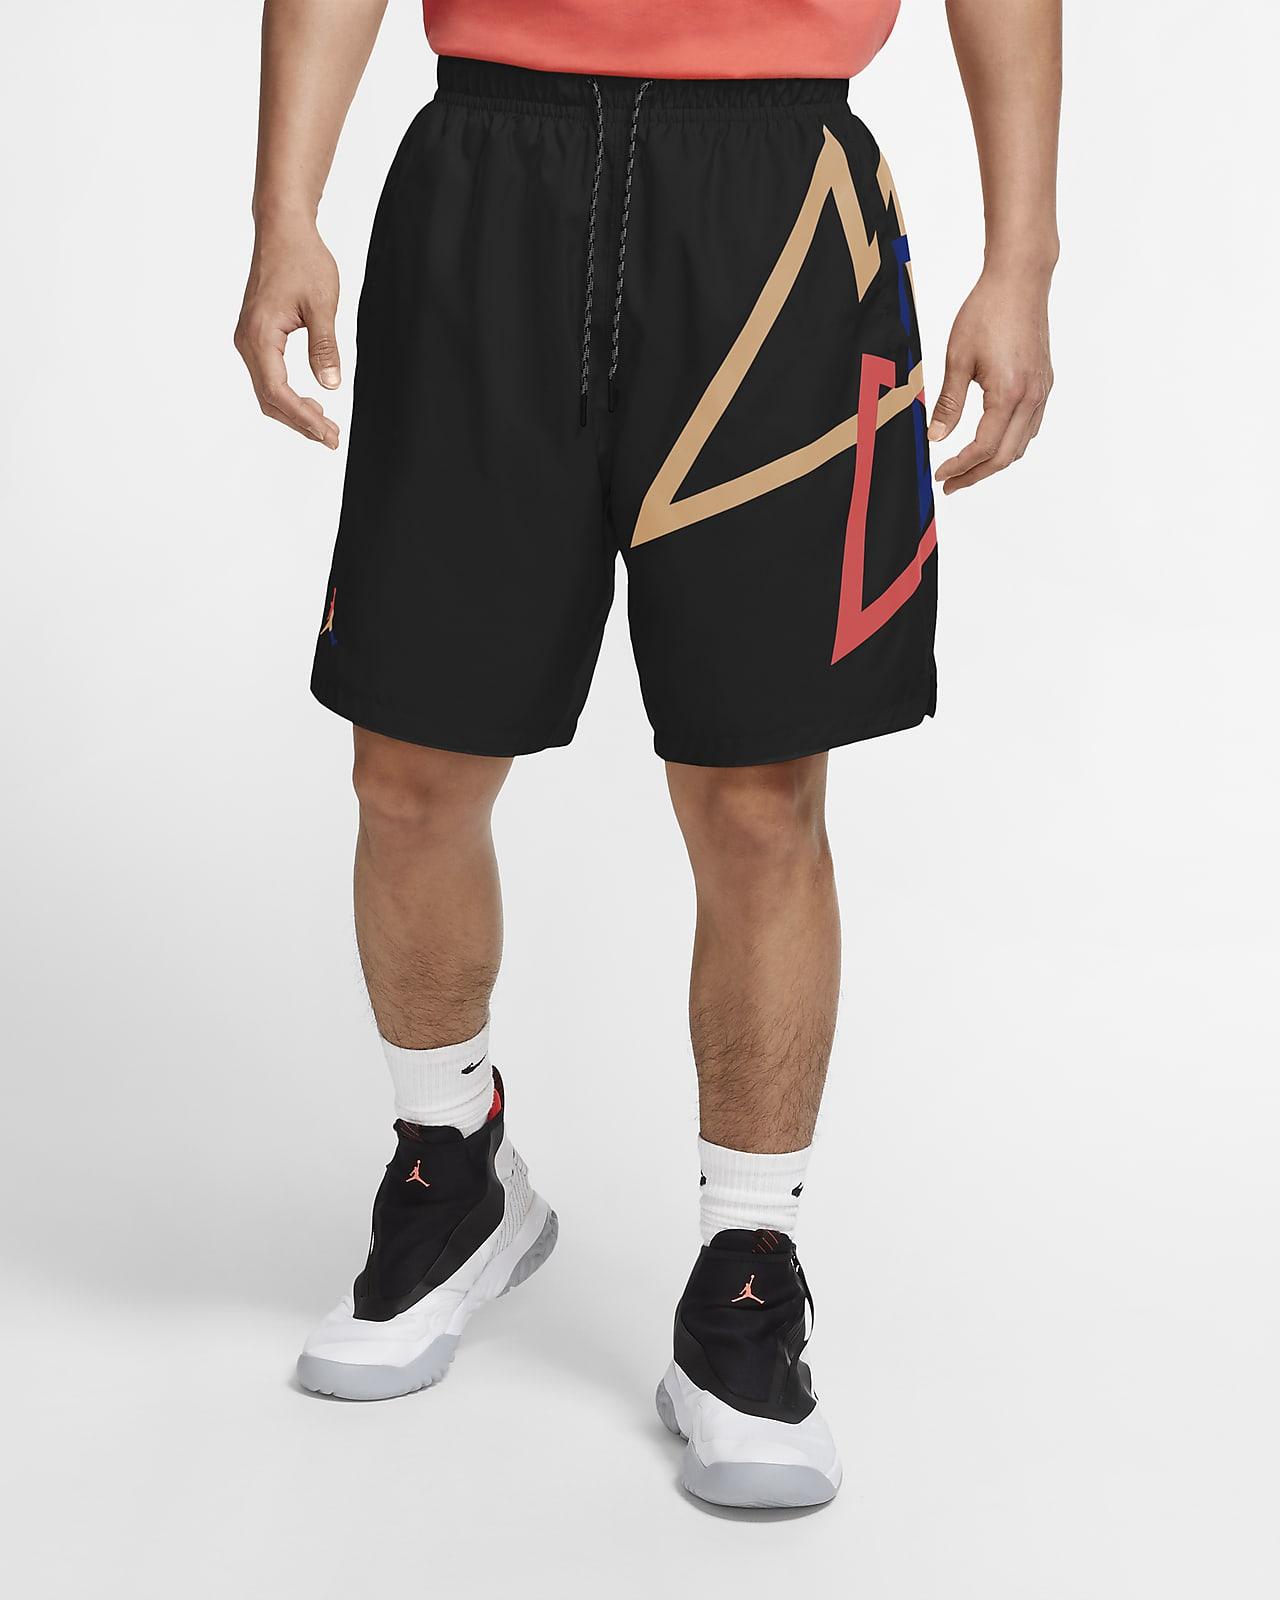 Jordan Sport DNA Men's Shorts